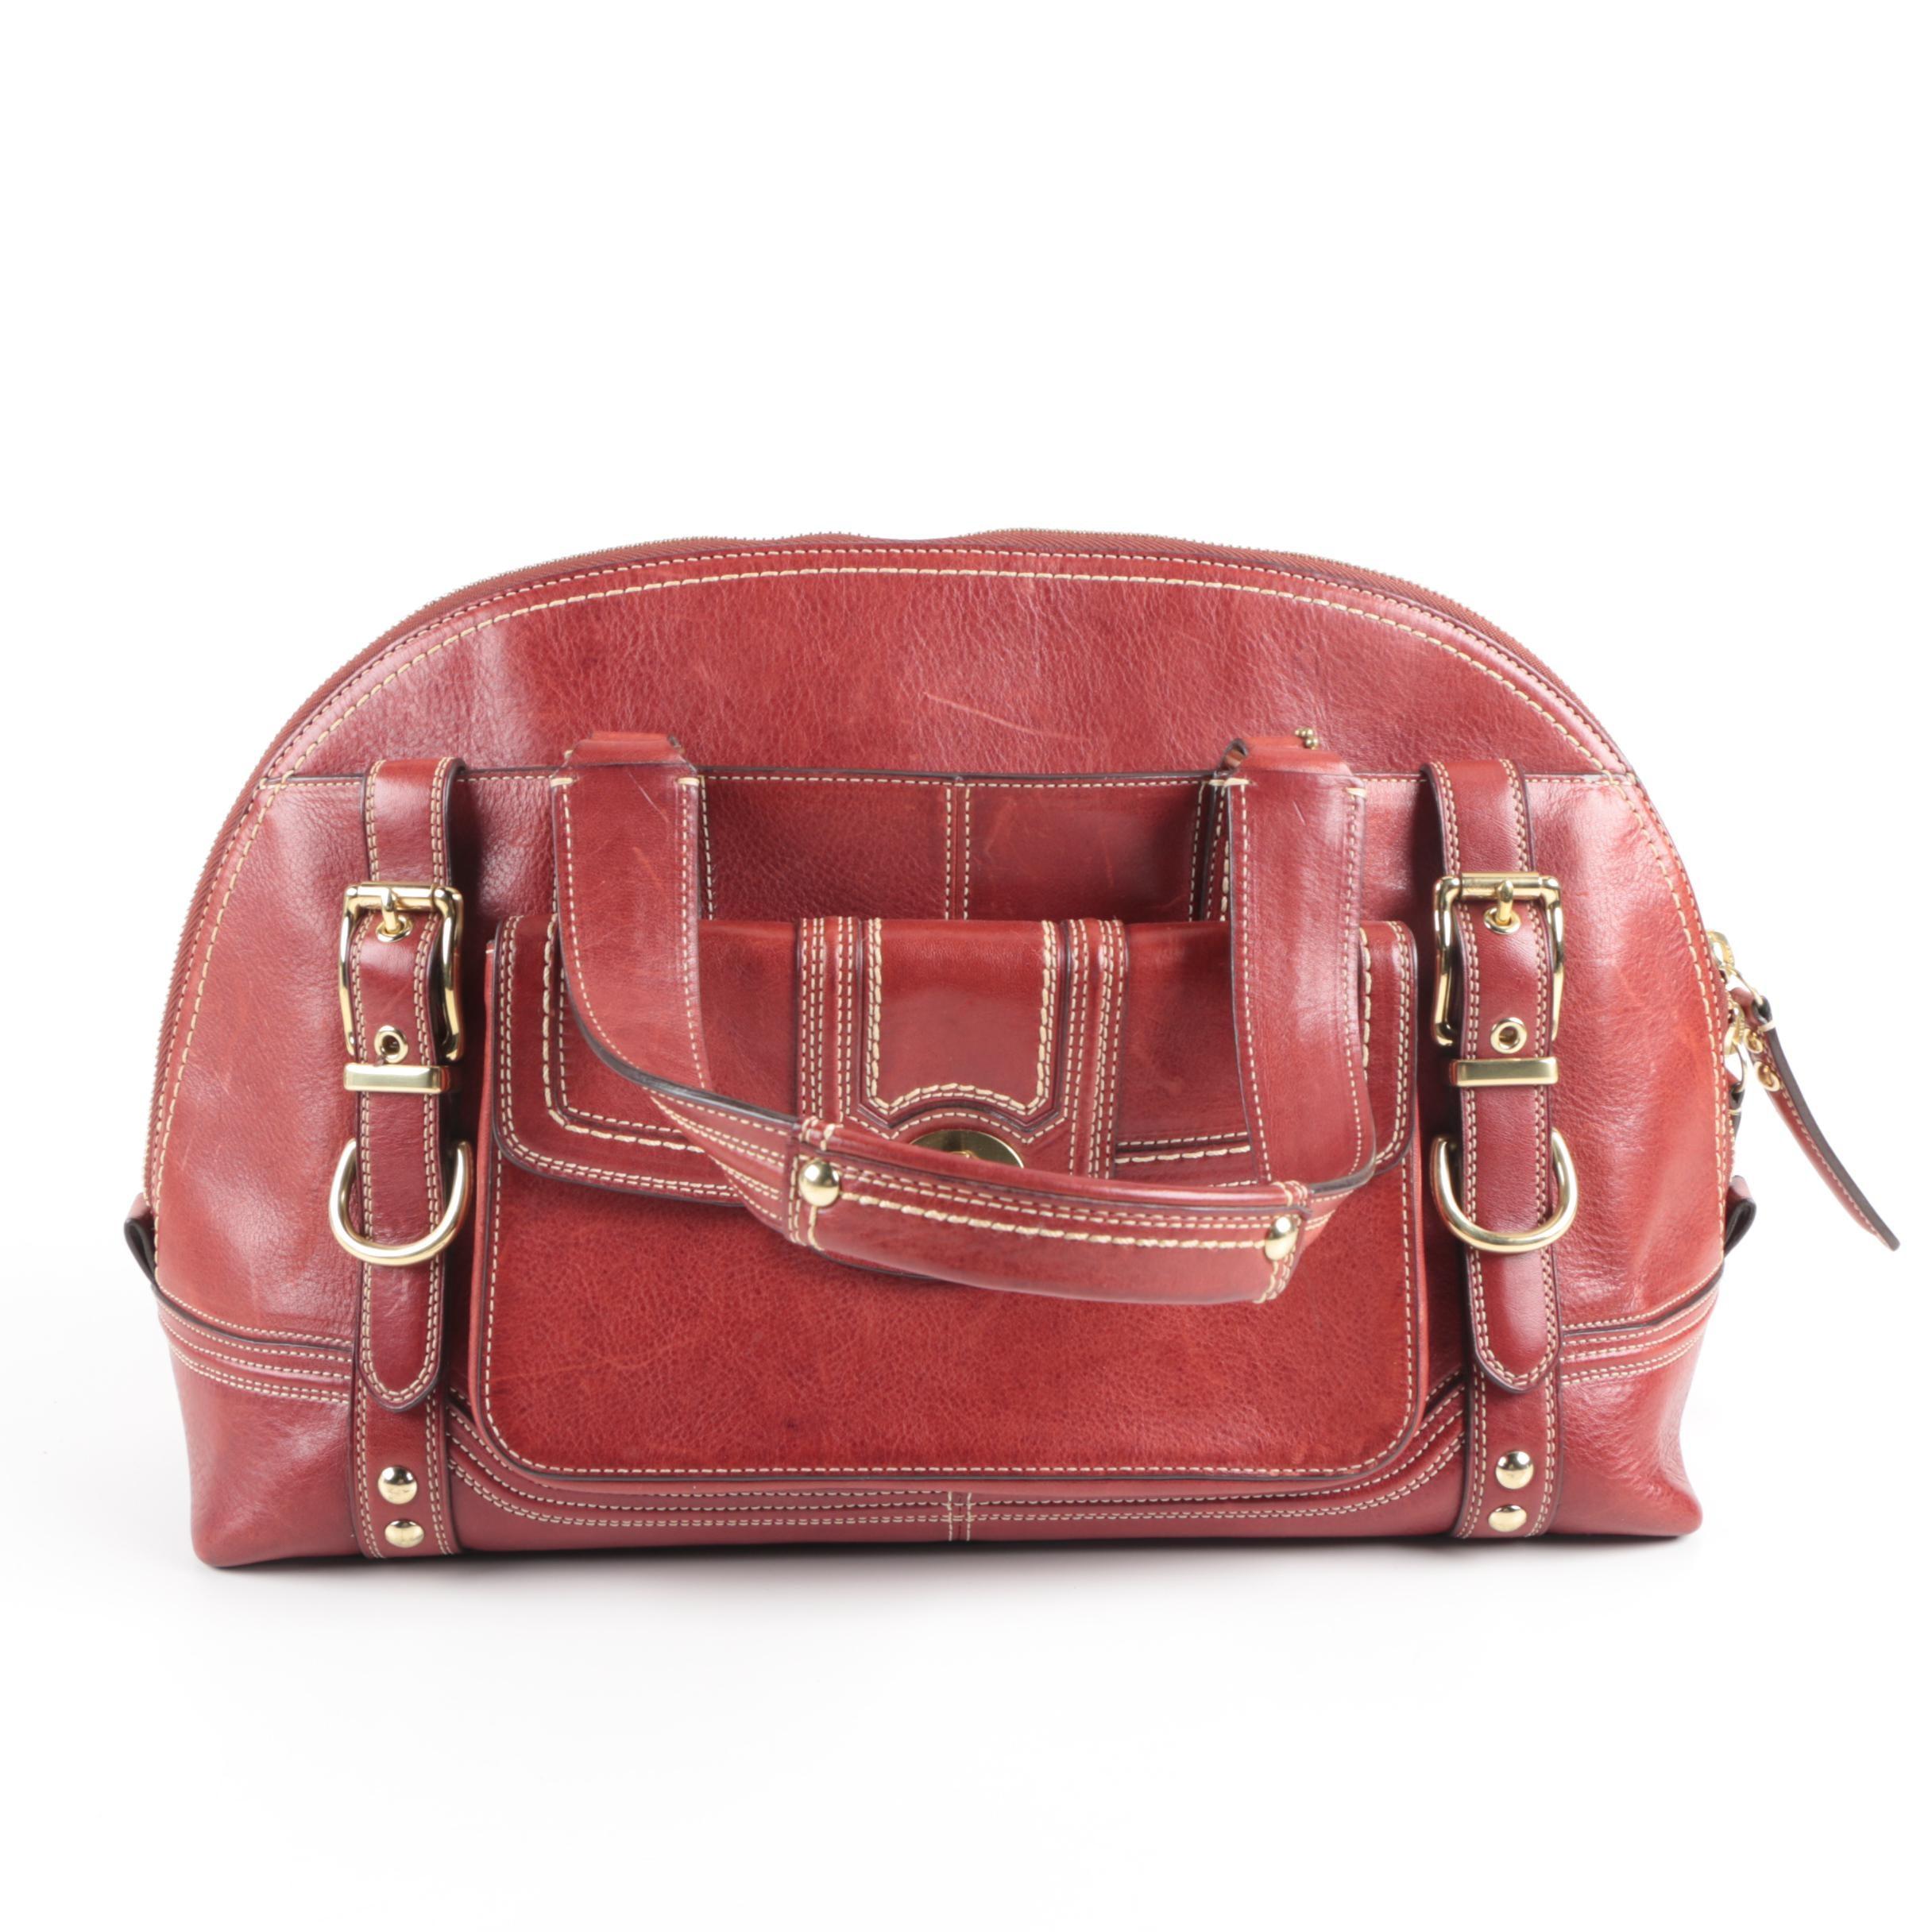 Vintage Coach  Miranda Red Leather Satchel Bag